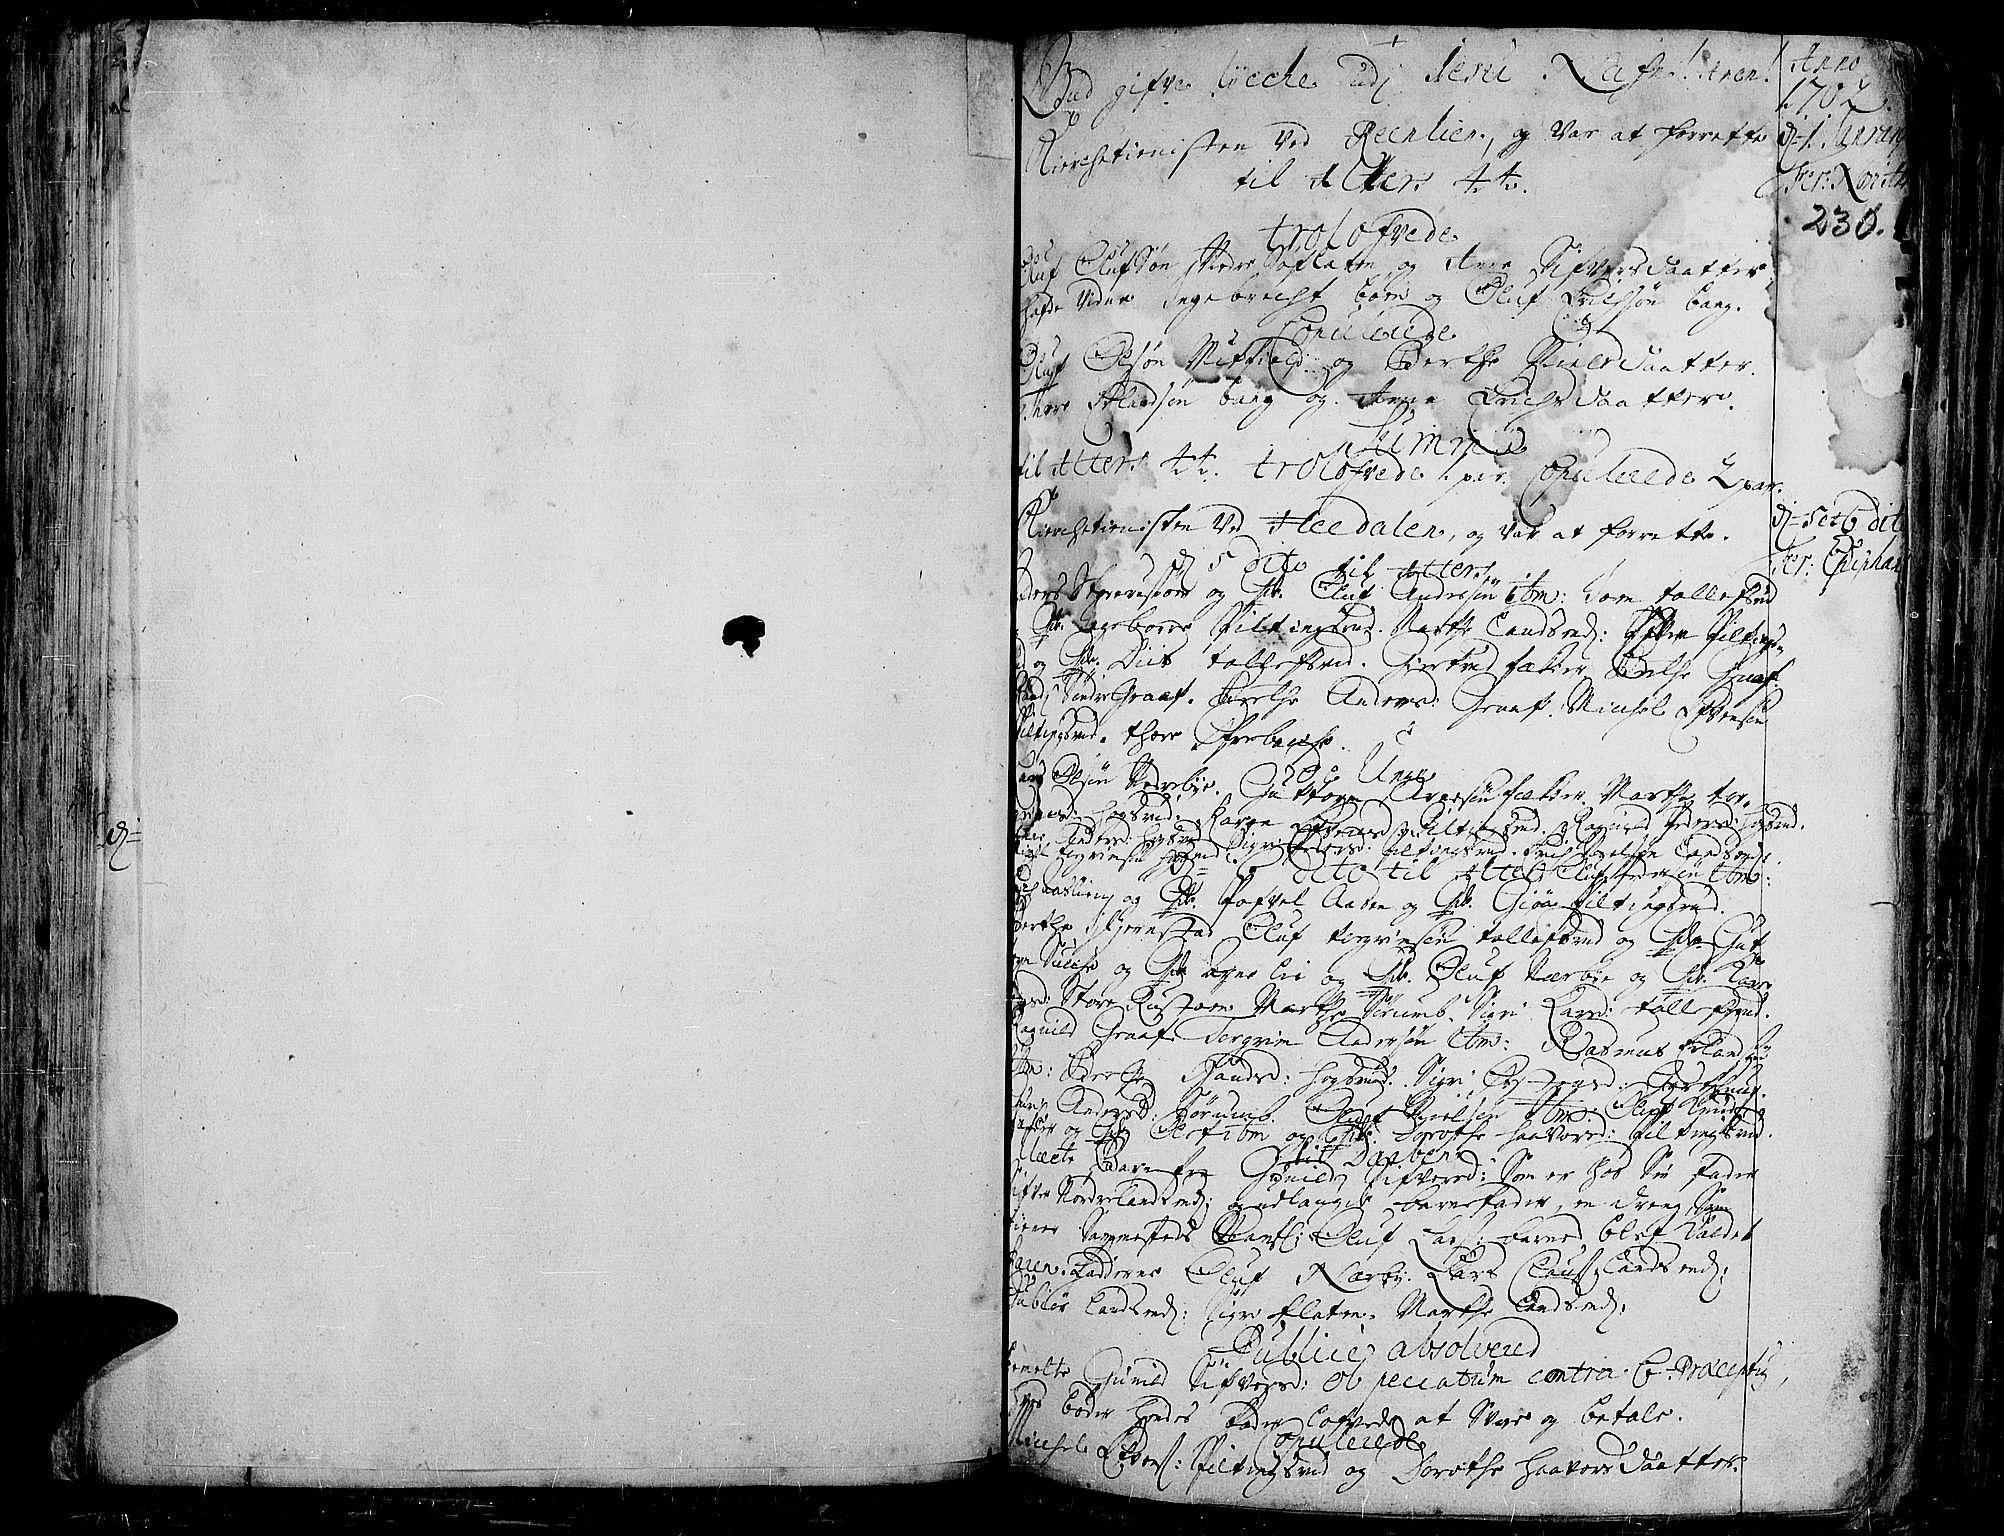 SAH, Aurdal prestekontor, Ministerialbok nr. 1-3, 1692-1730, s. 230